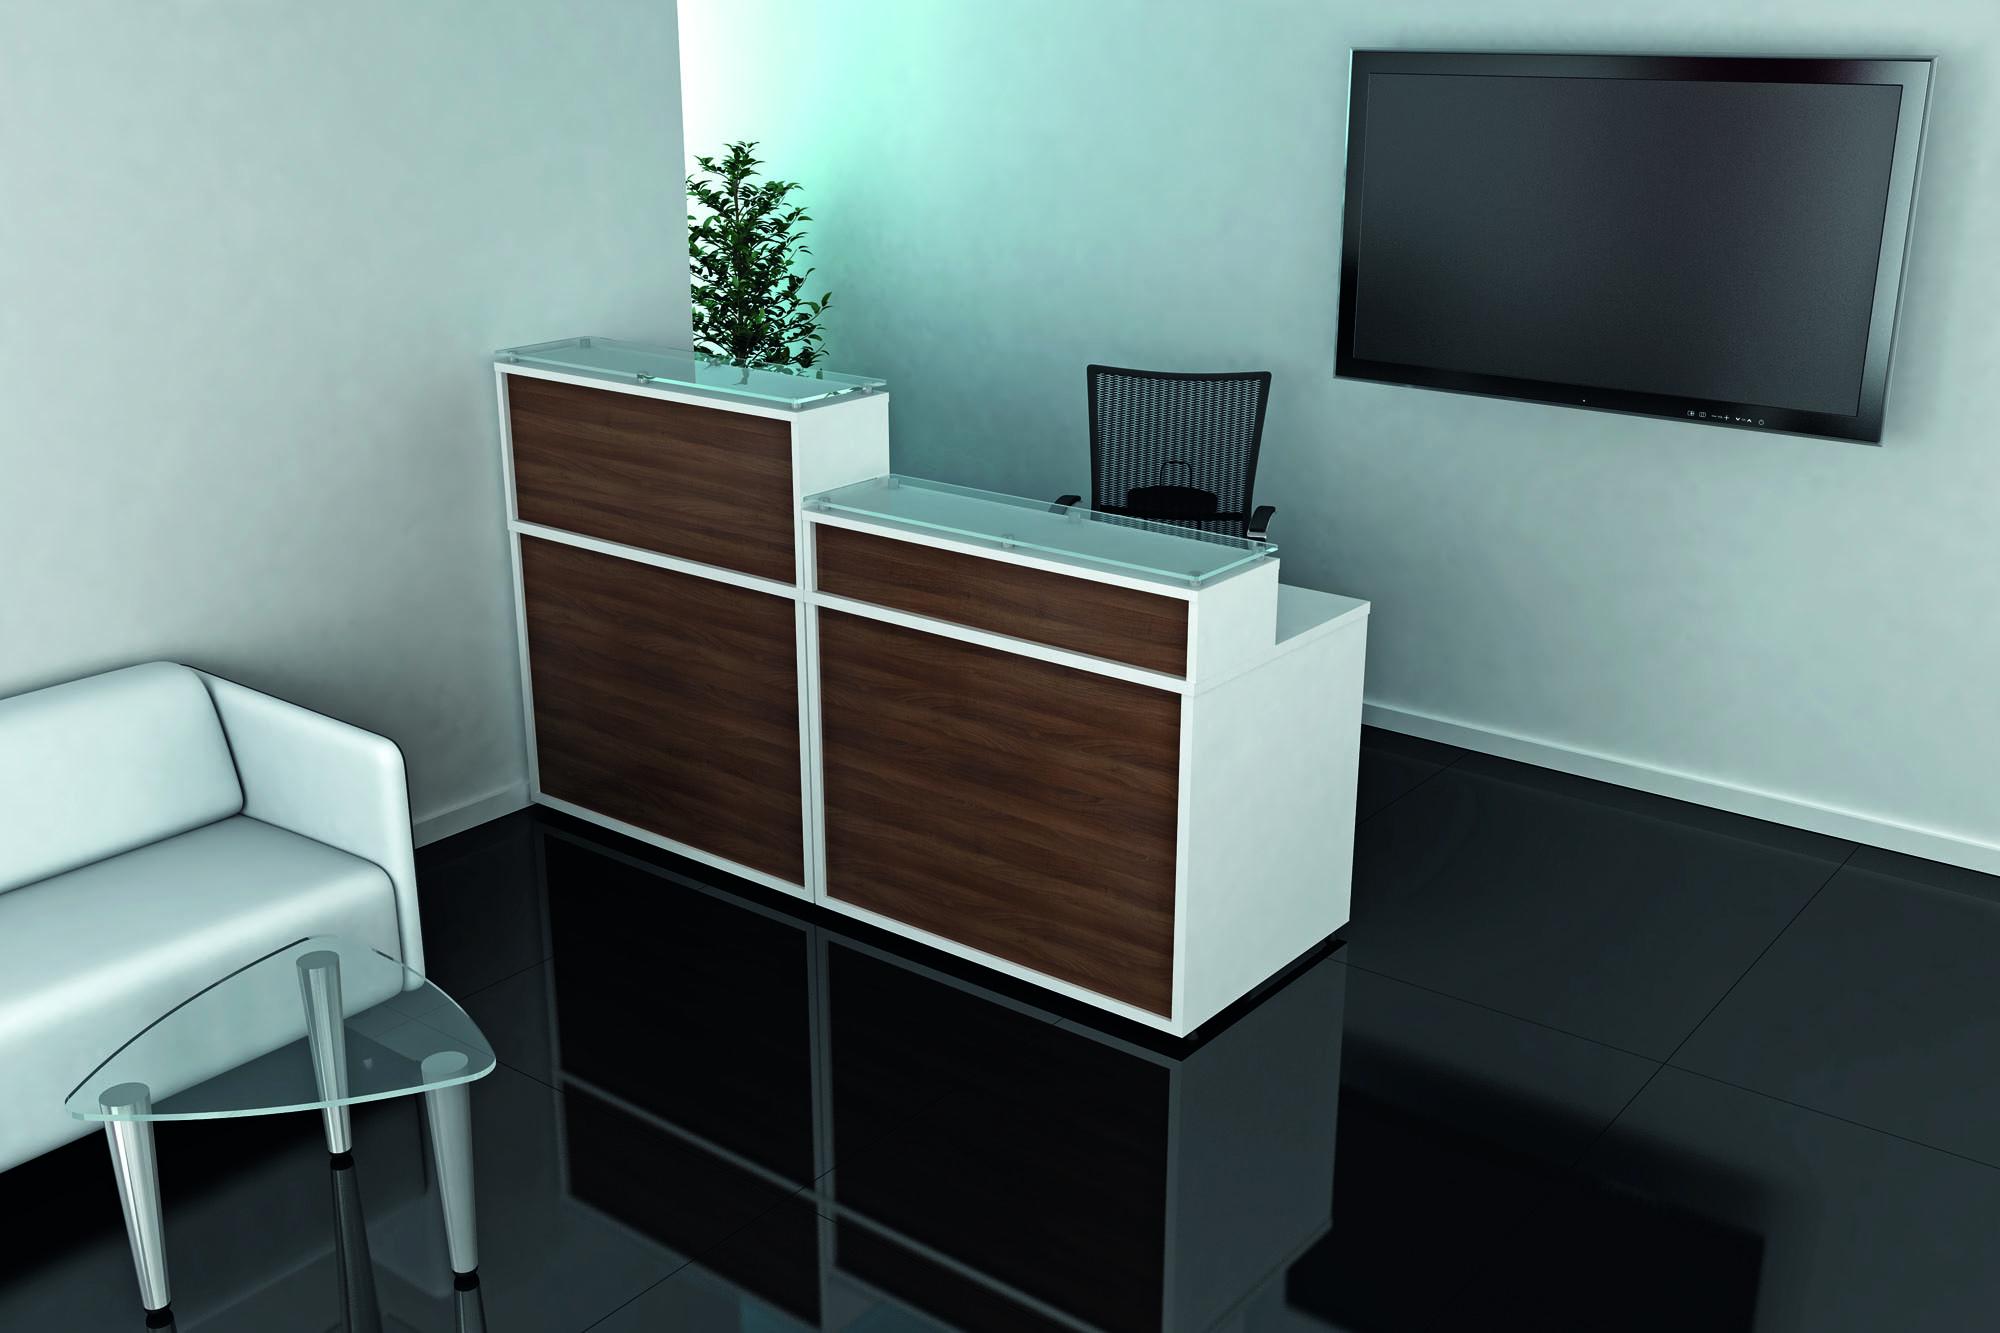 Reception-mid-level-IMAGE 13